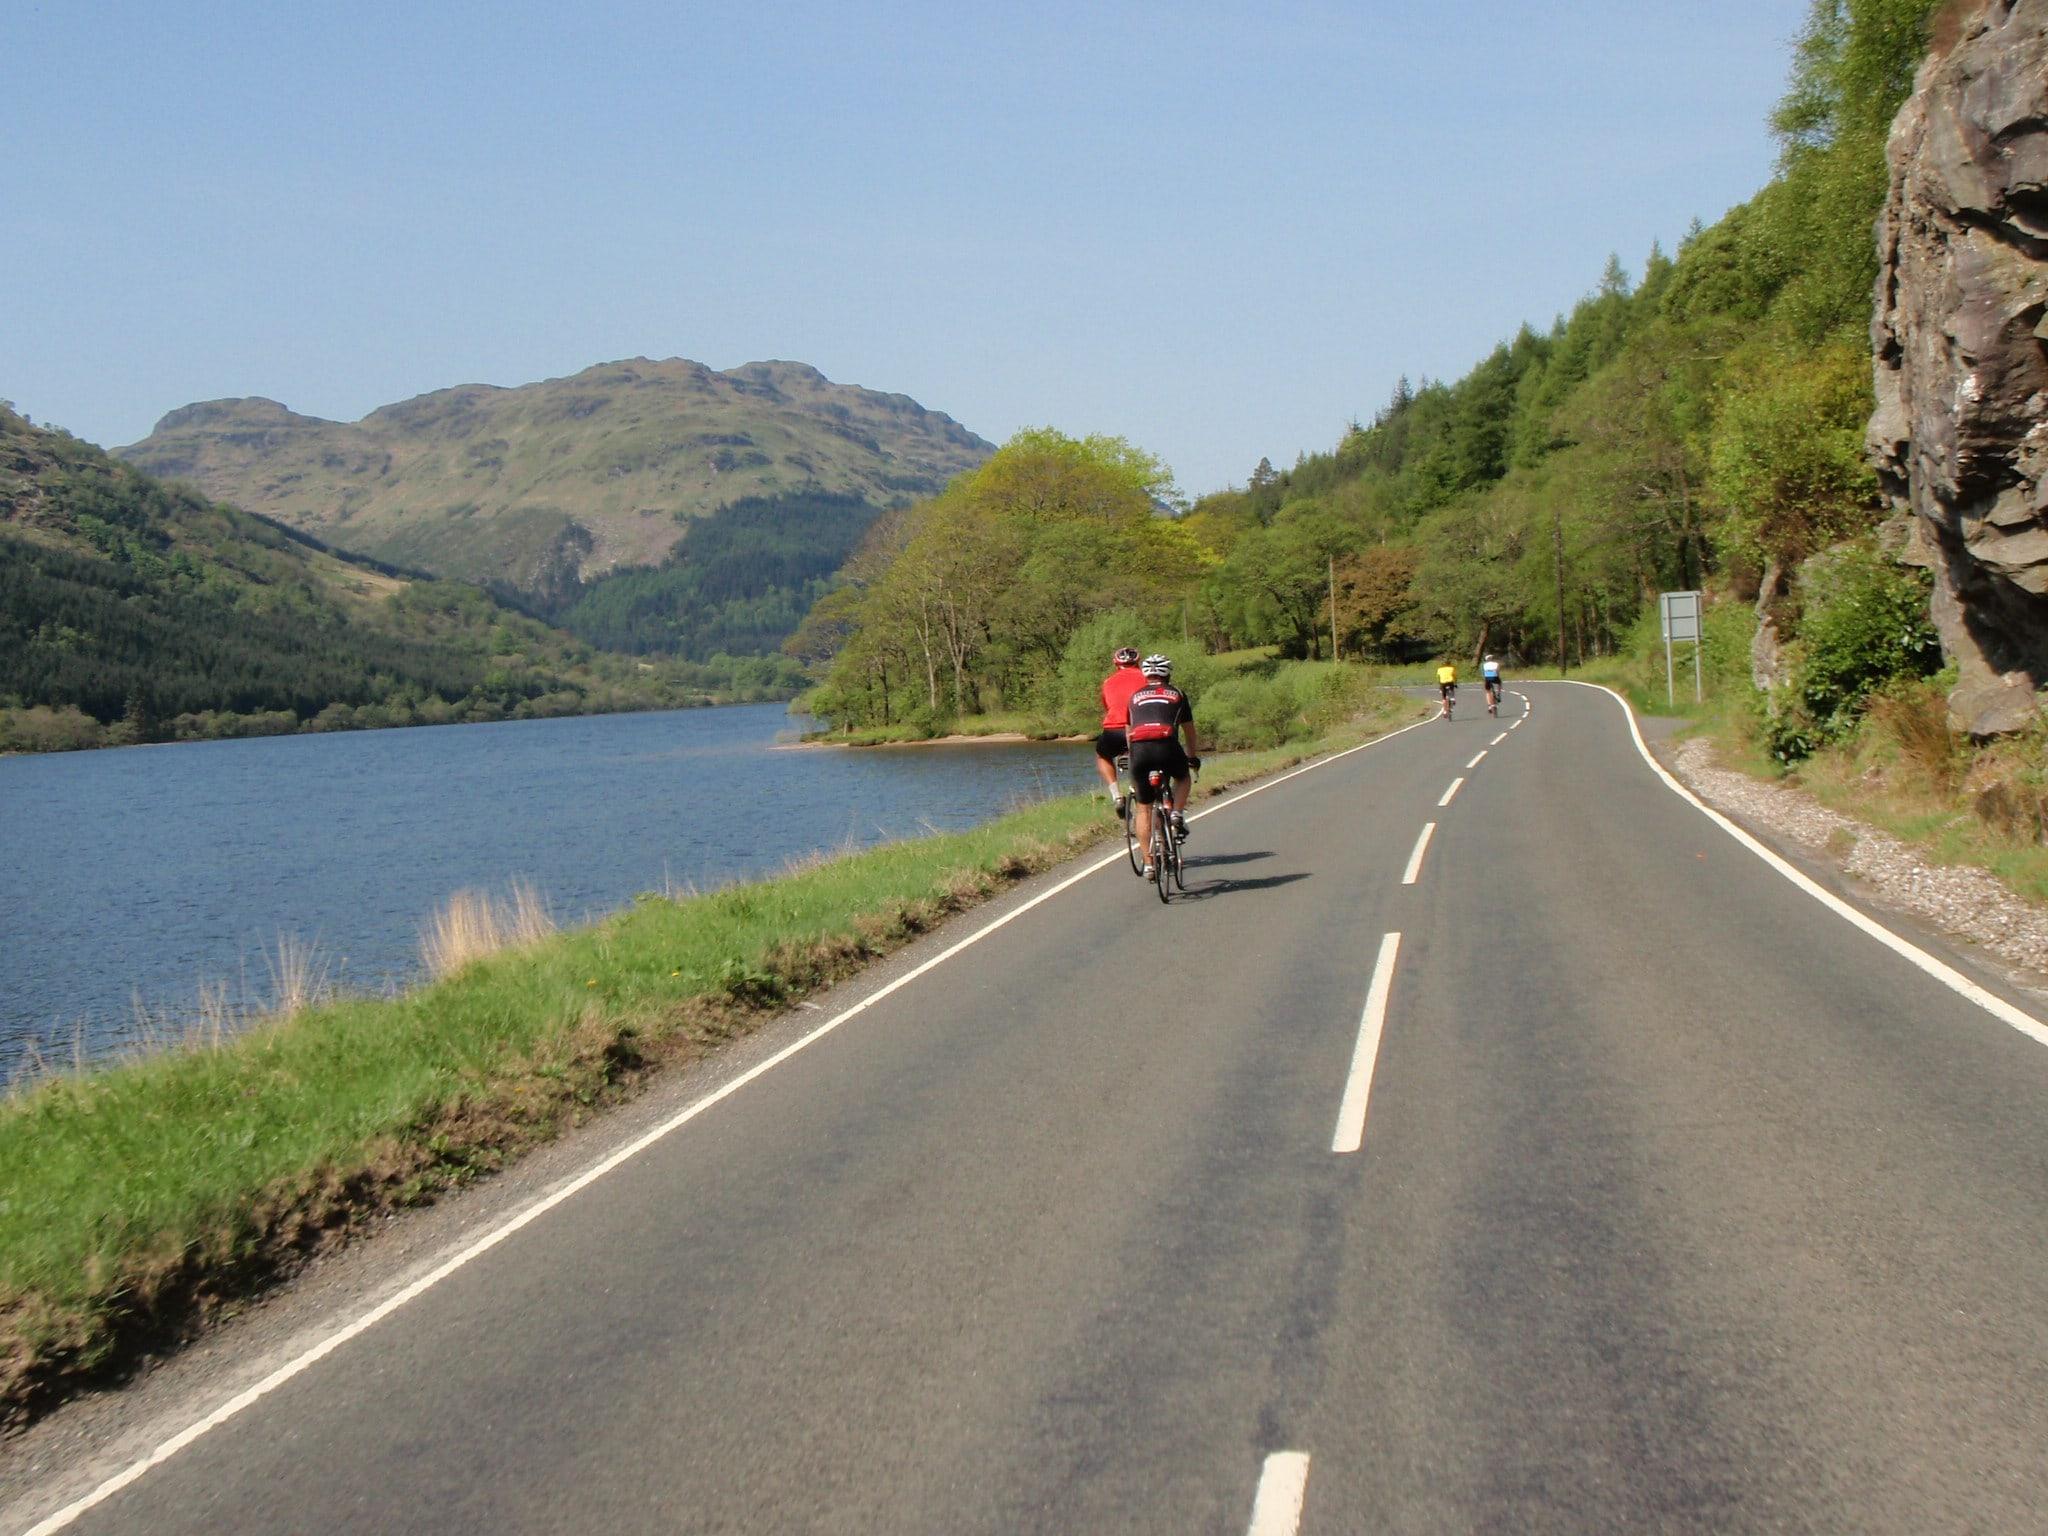 cycle lands end to john ogroats